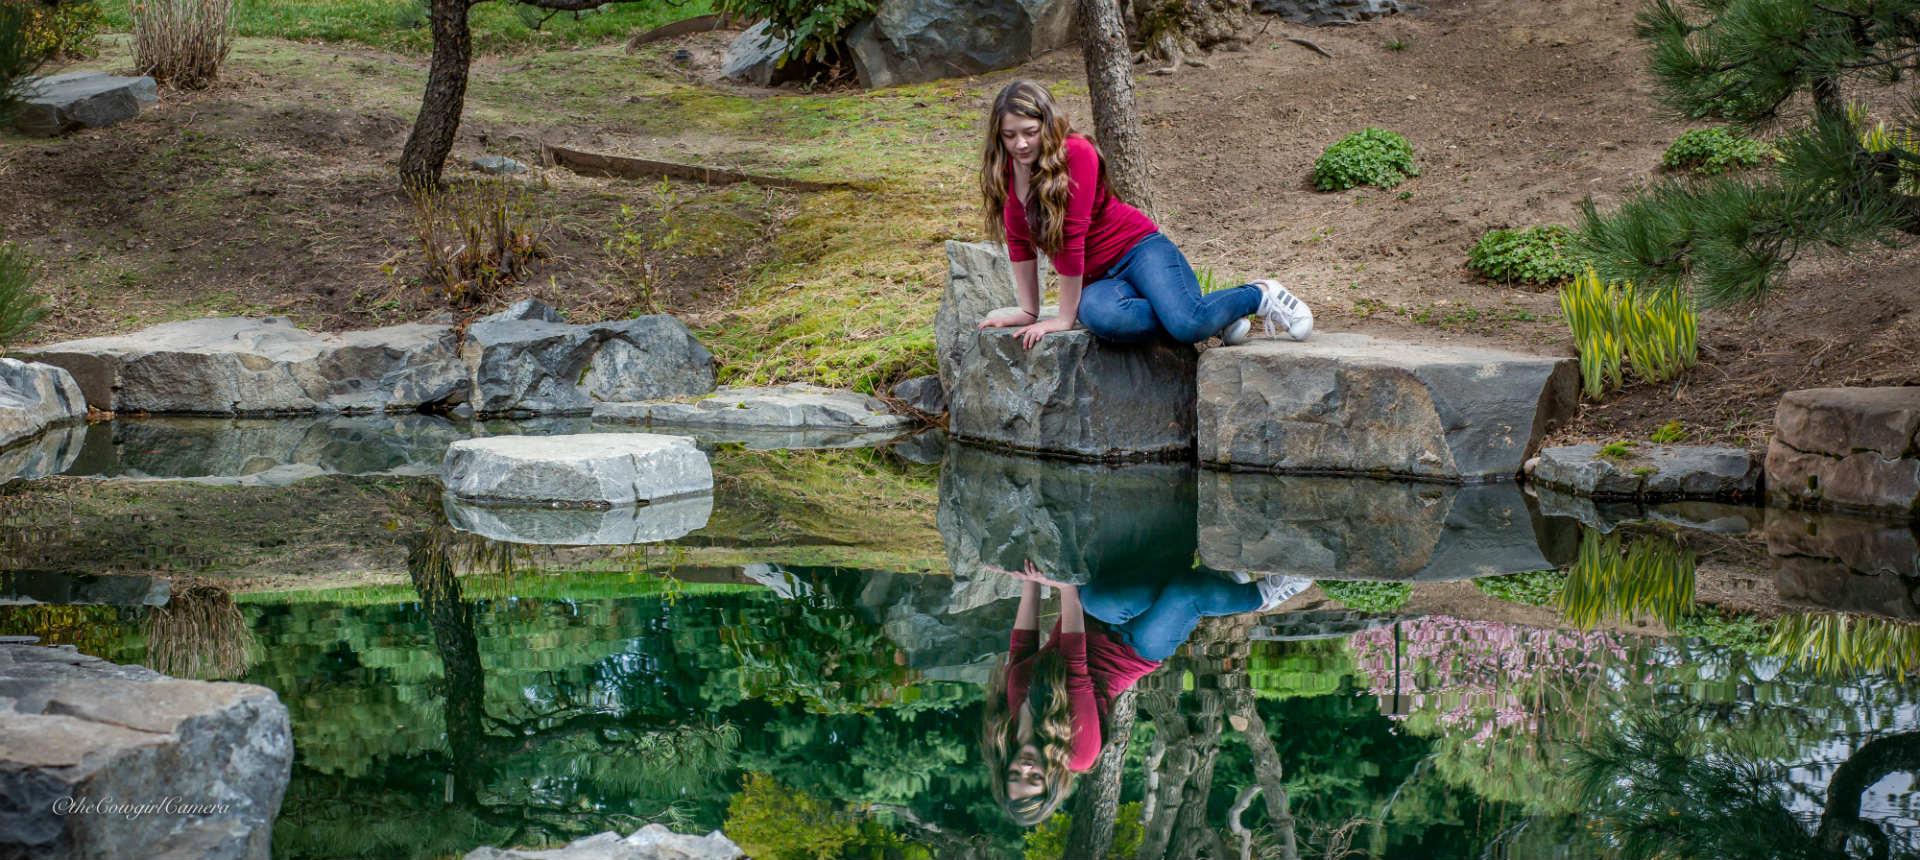 Spontaneous Wedding Photographer - Professional Wedding Photographer in Denver, CO